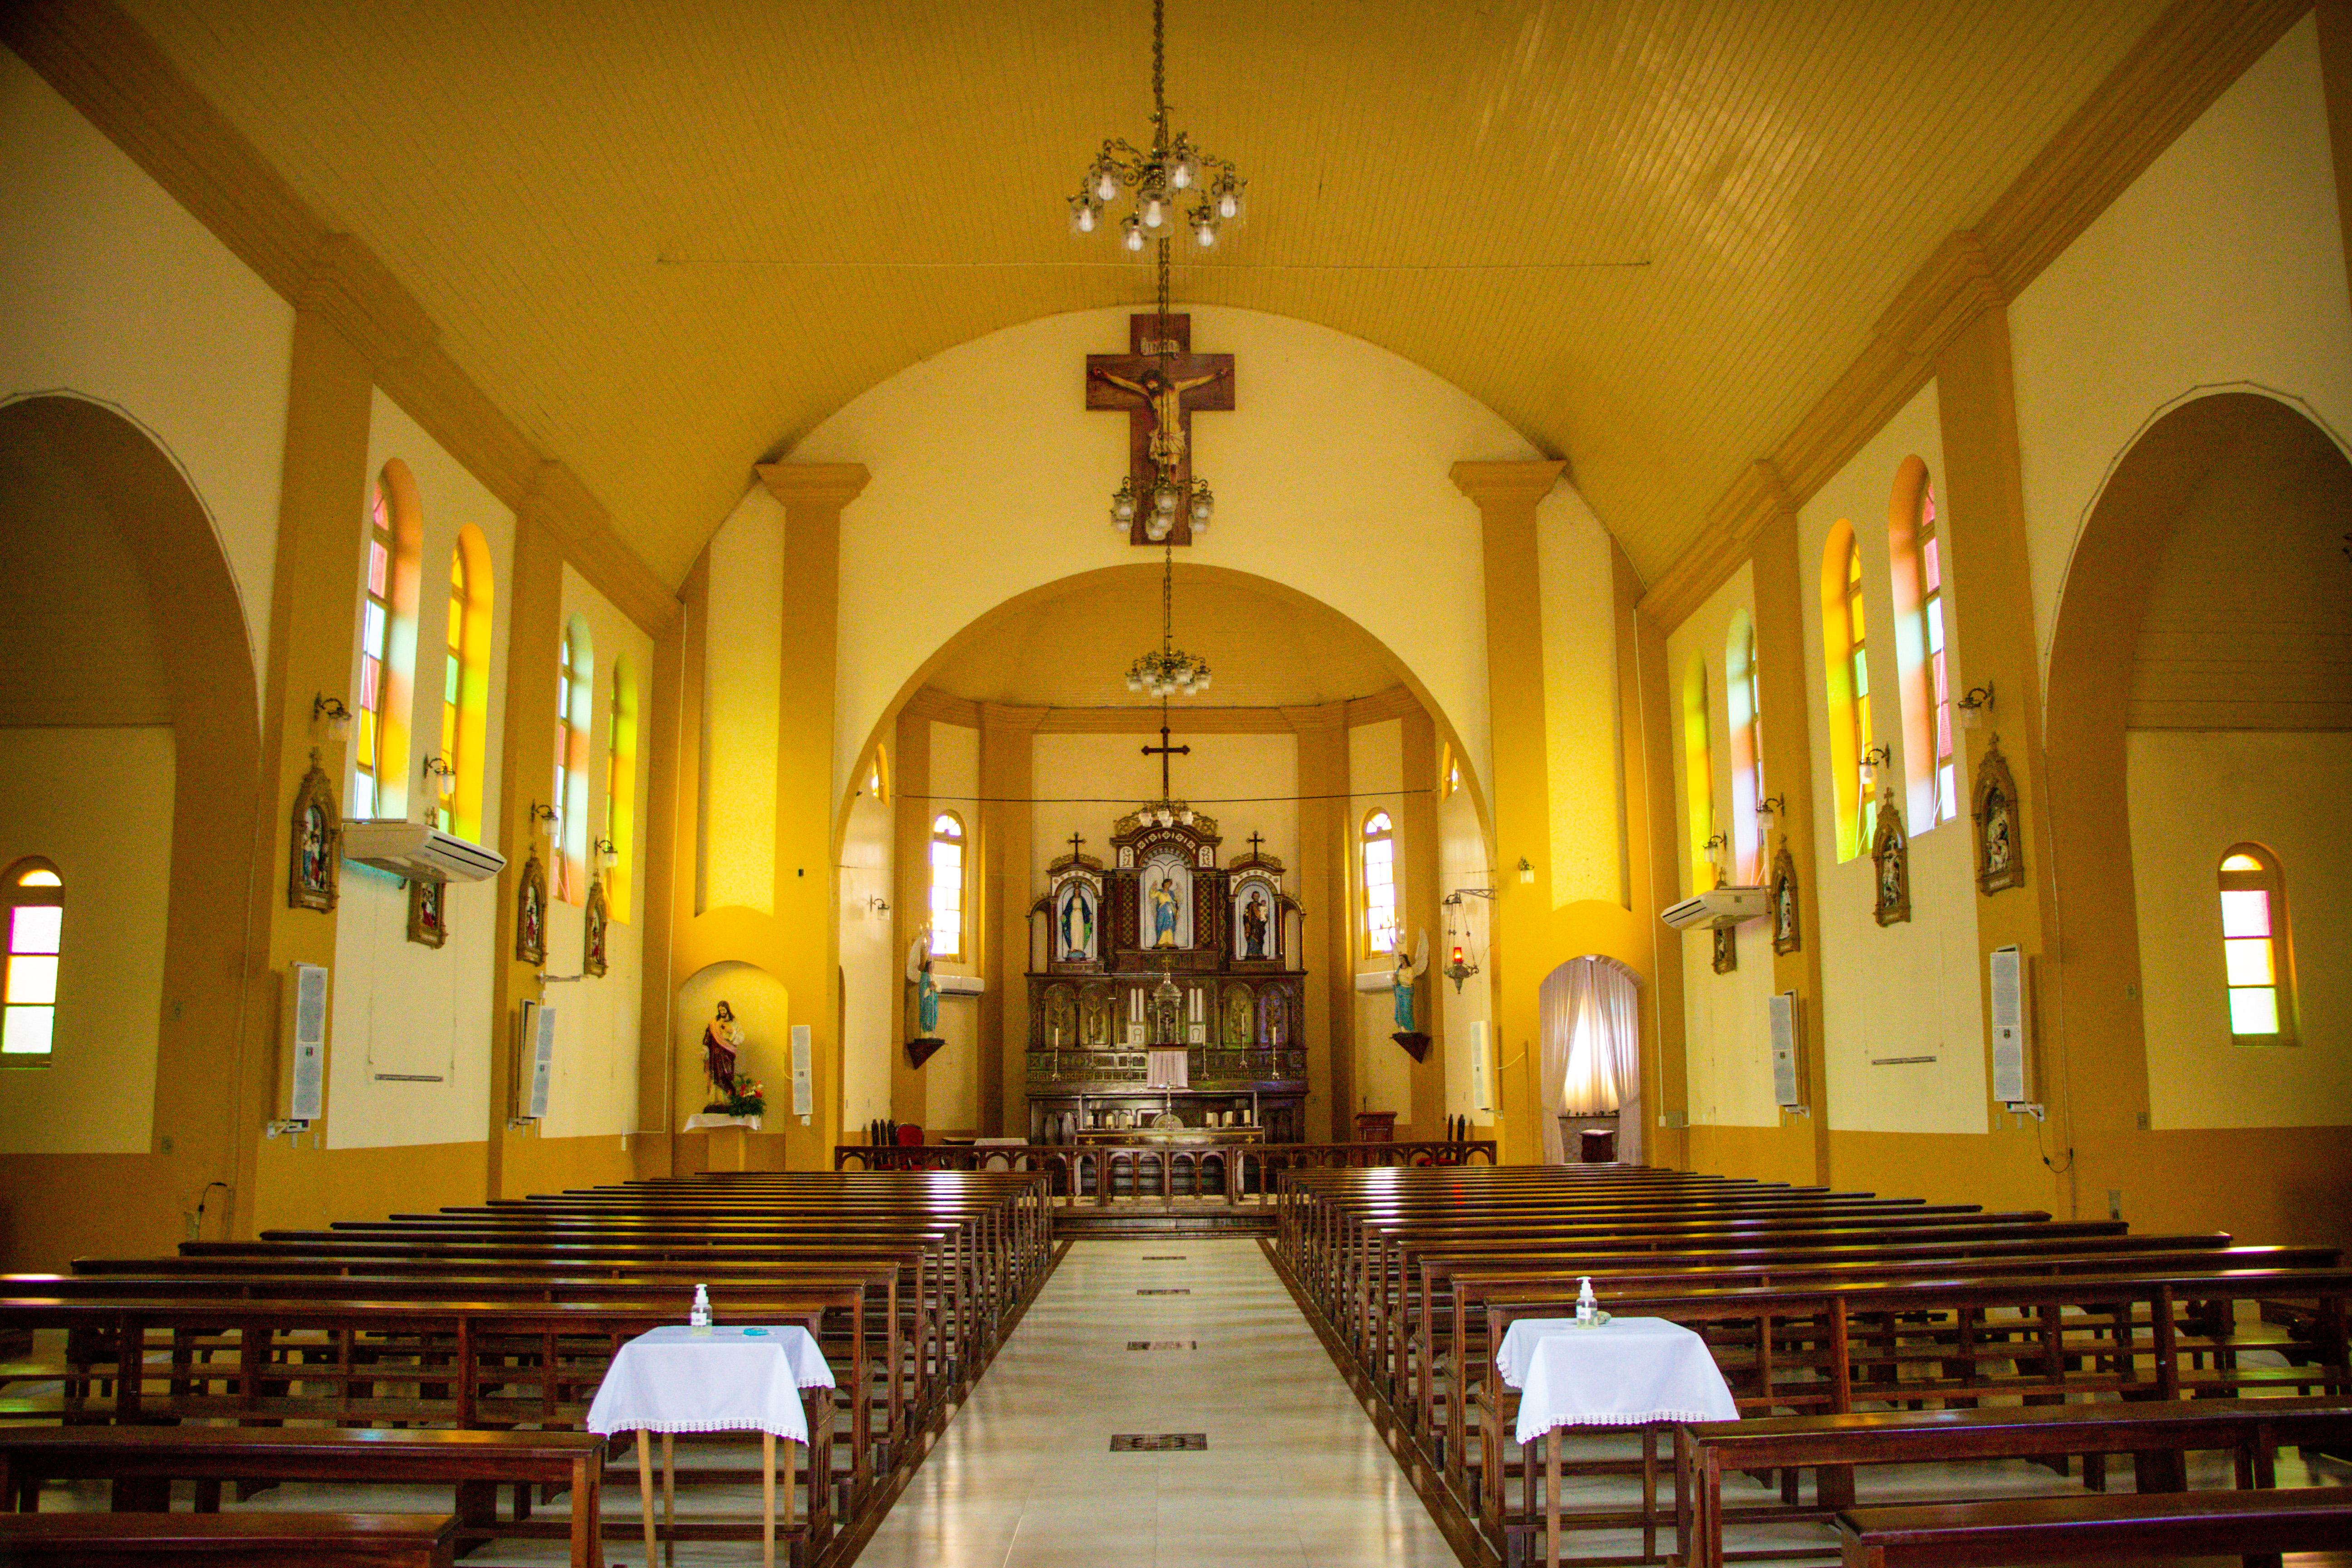 PEDRAS GRANDES, Igreja Matriz de São Gabriel